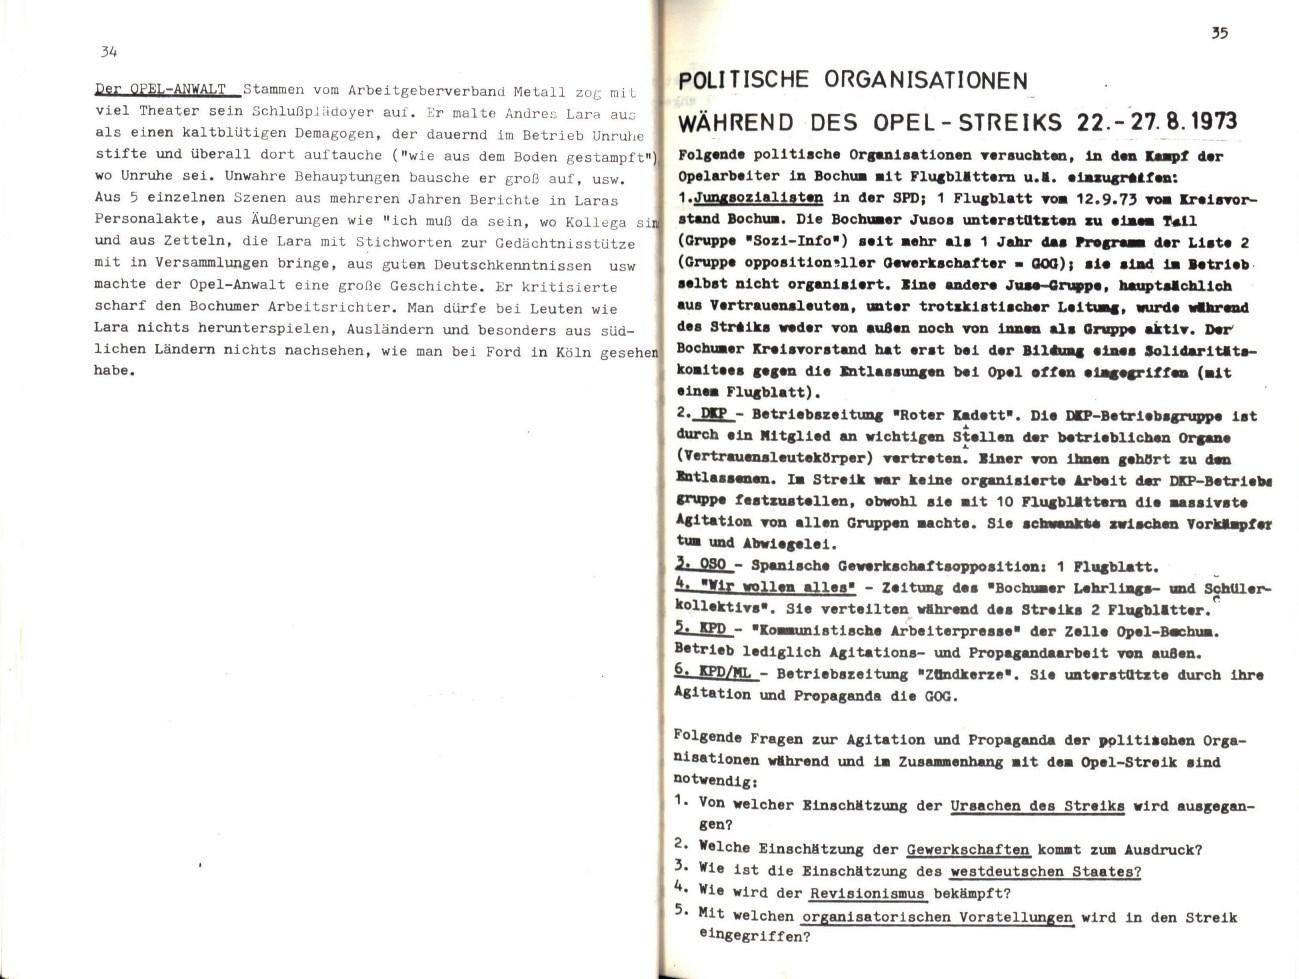 Bochum_IGM_Opel_PG_Opel_streikt_1973_019